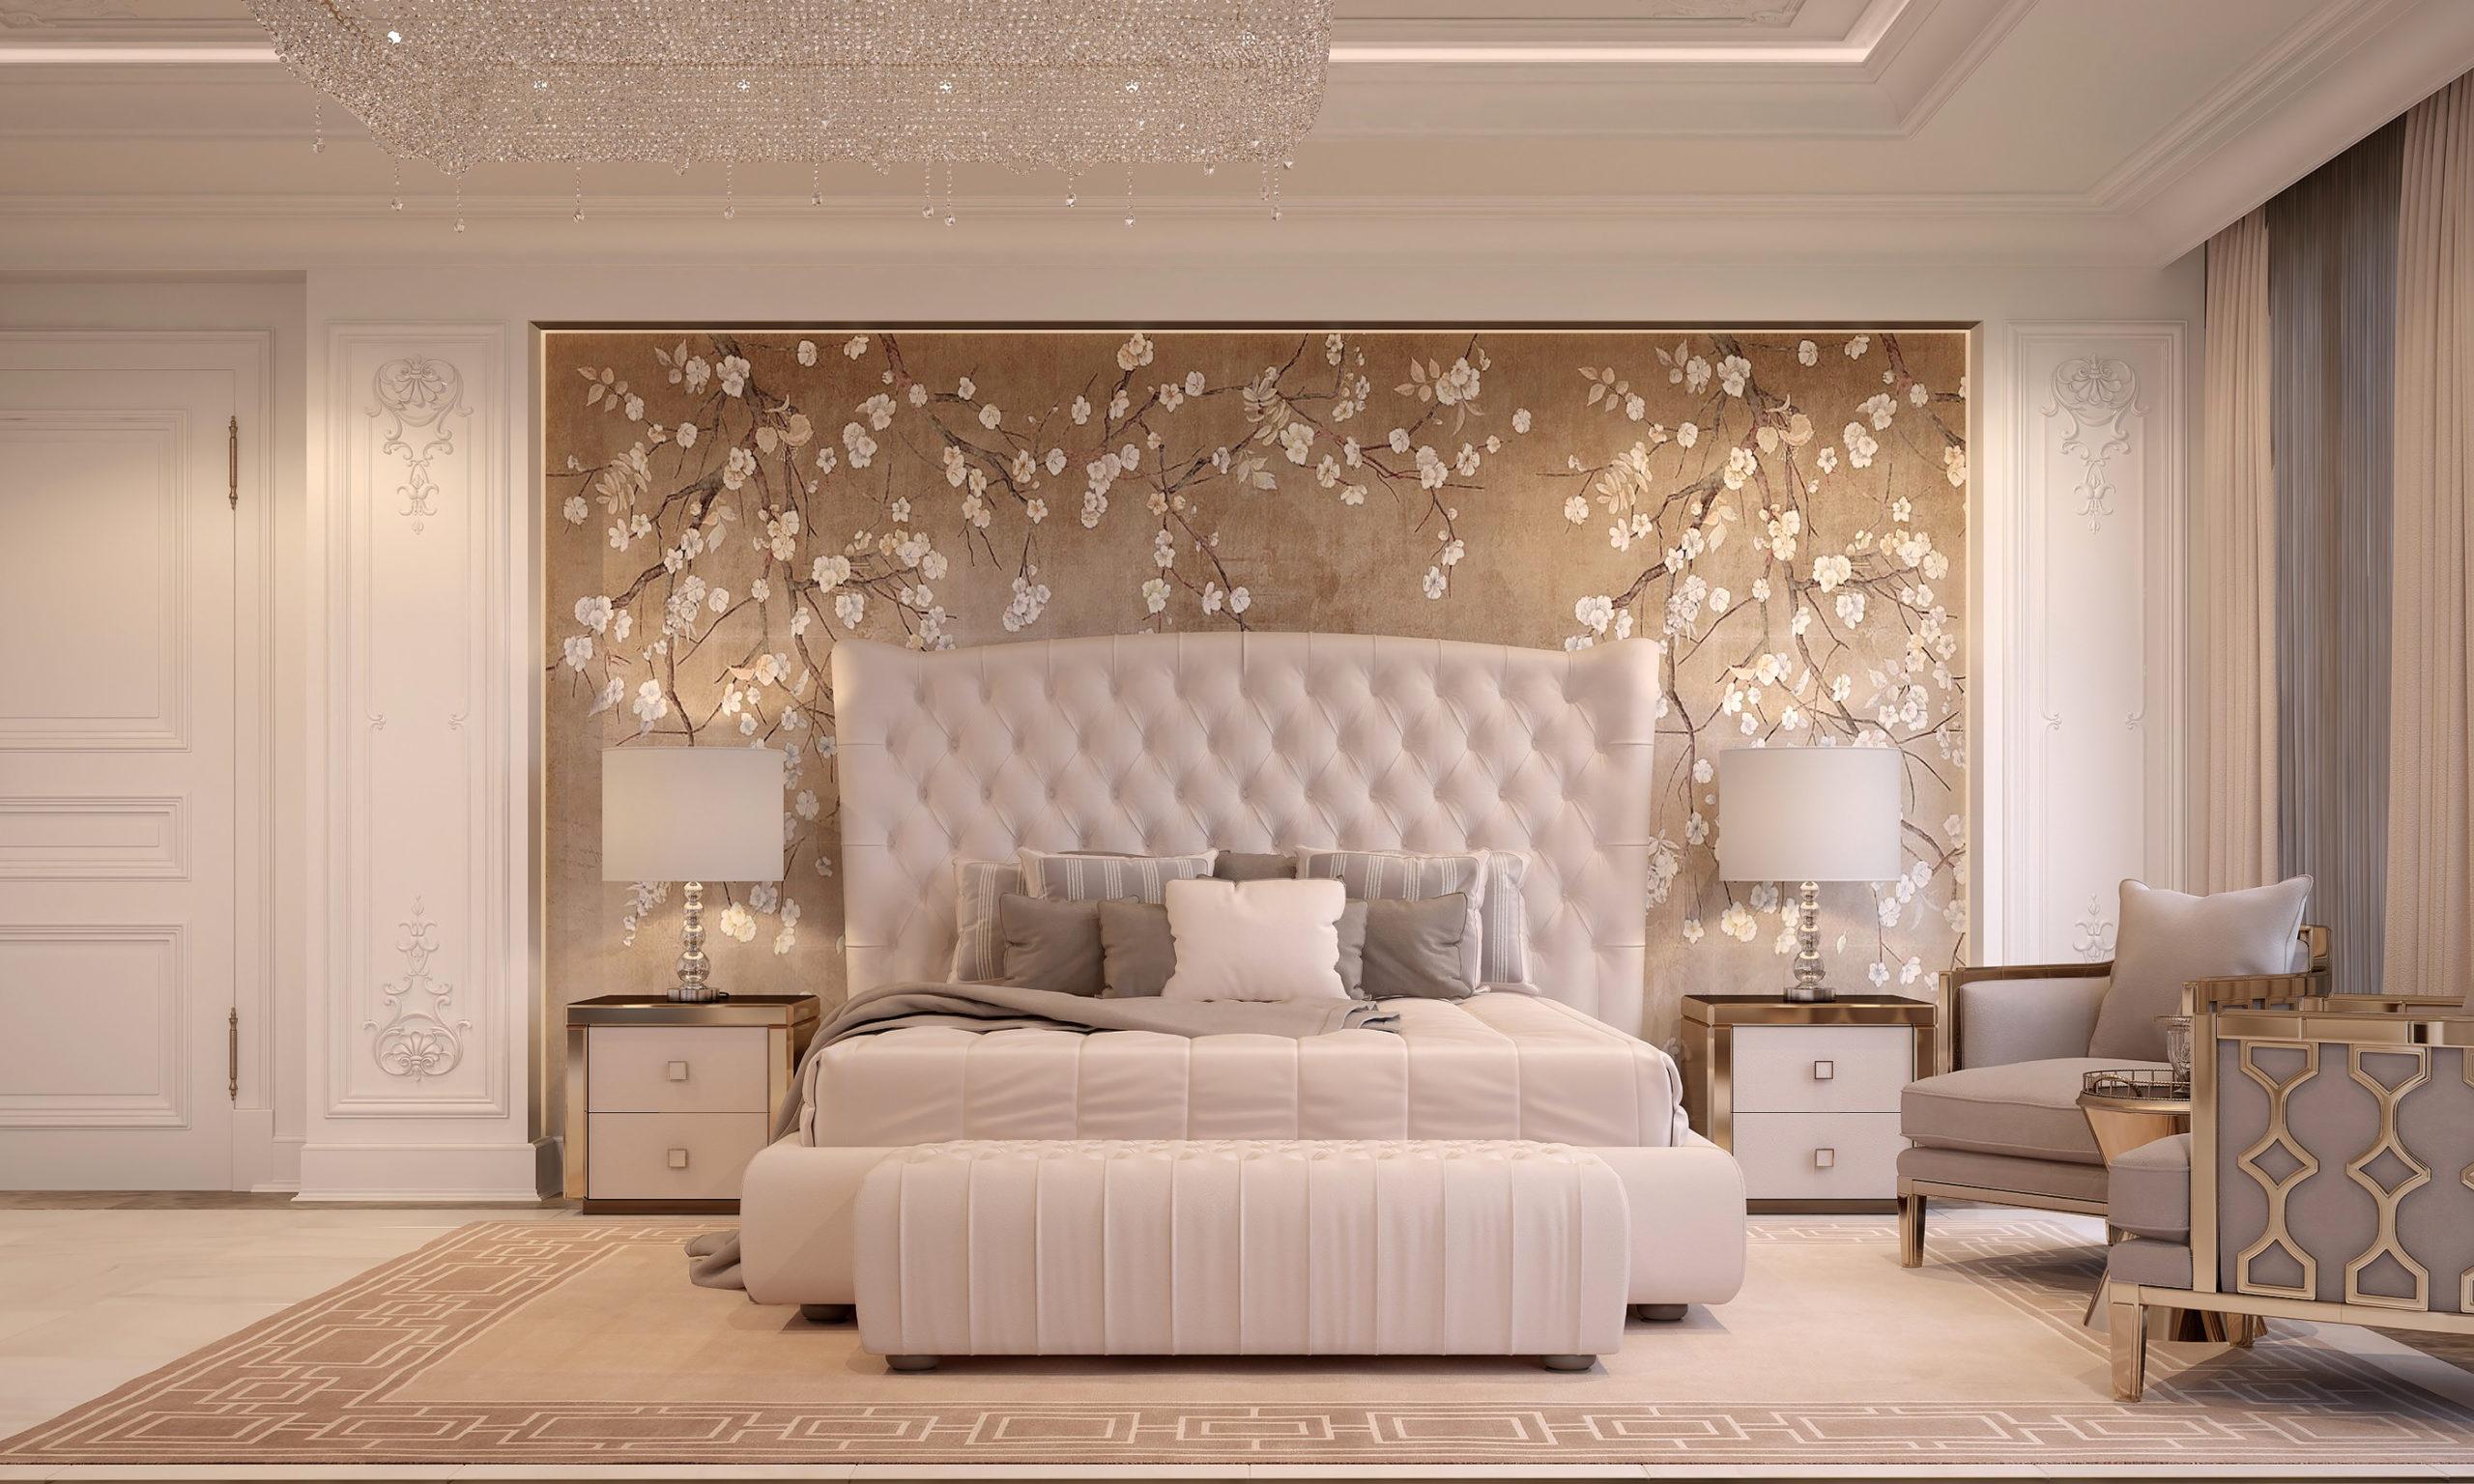 Kensington Luxury Bedroom Furniture 1